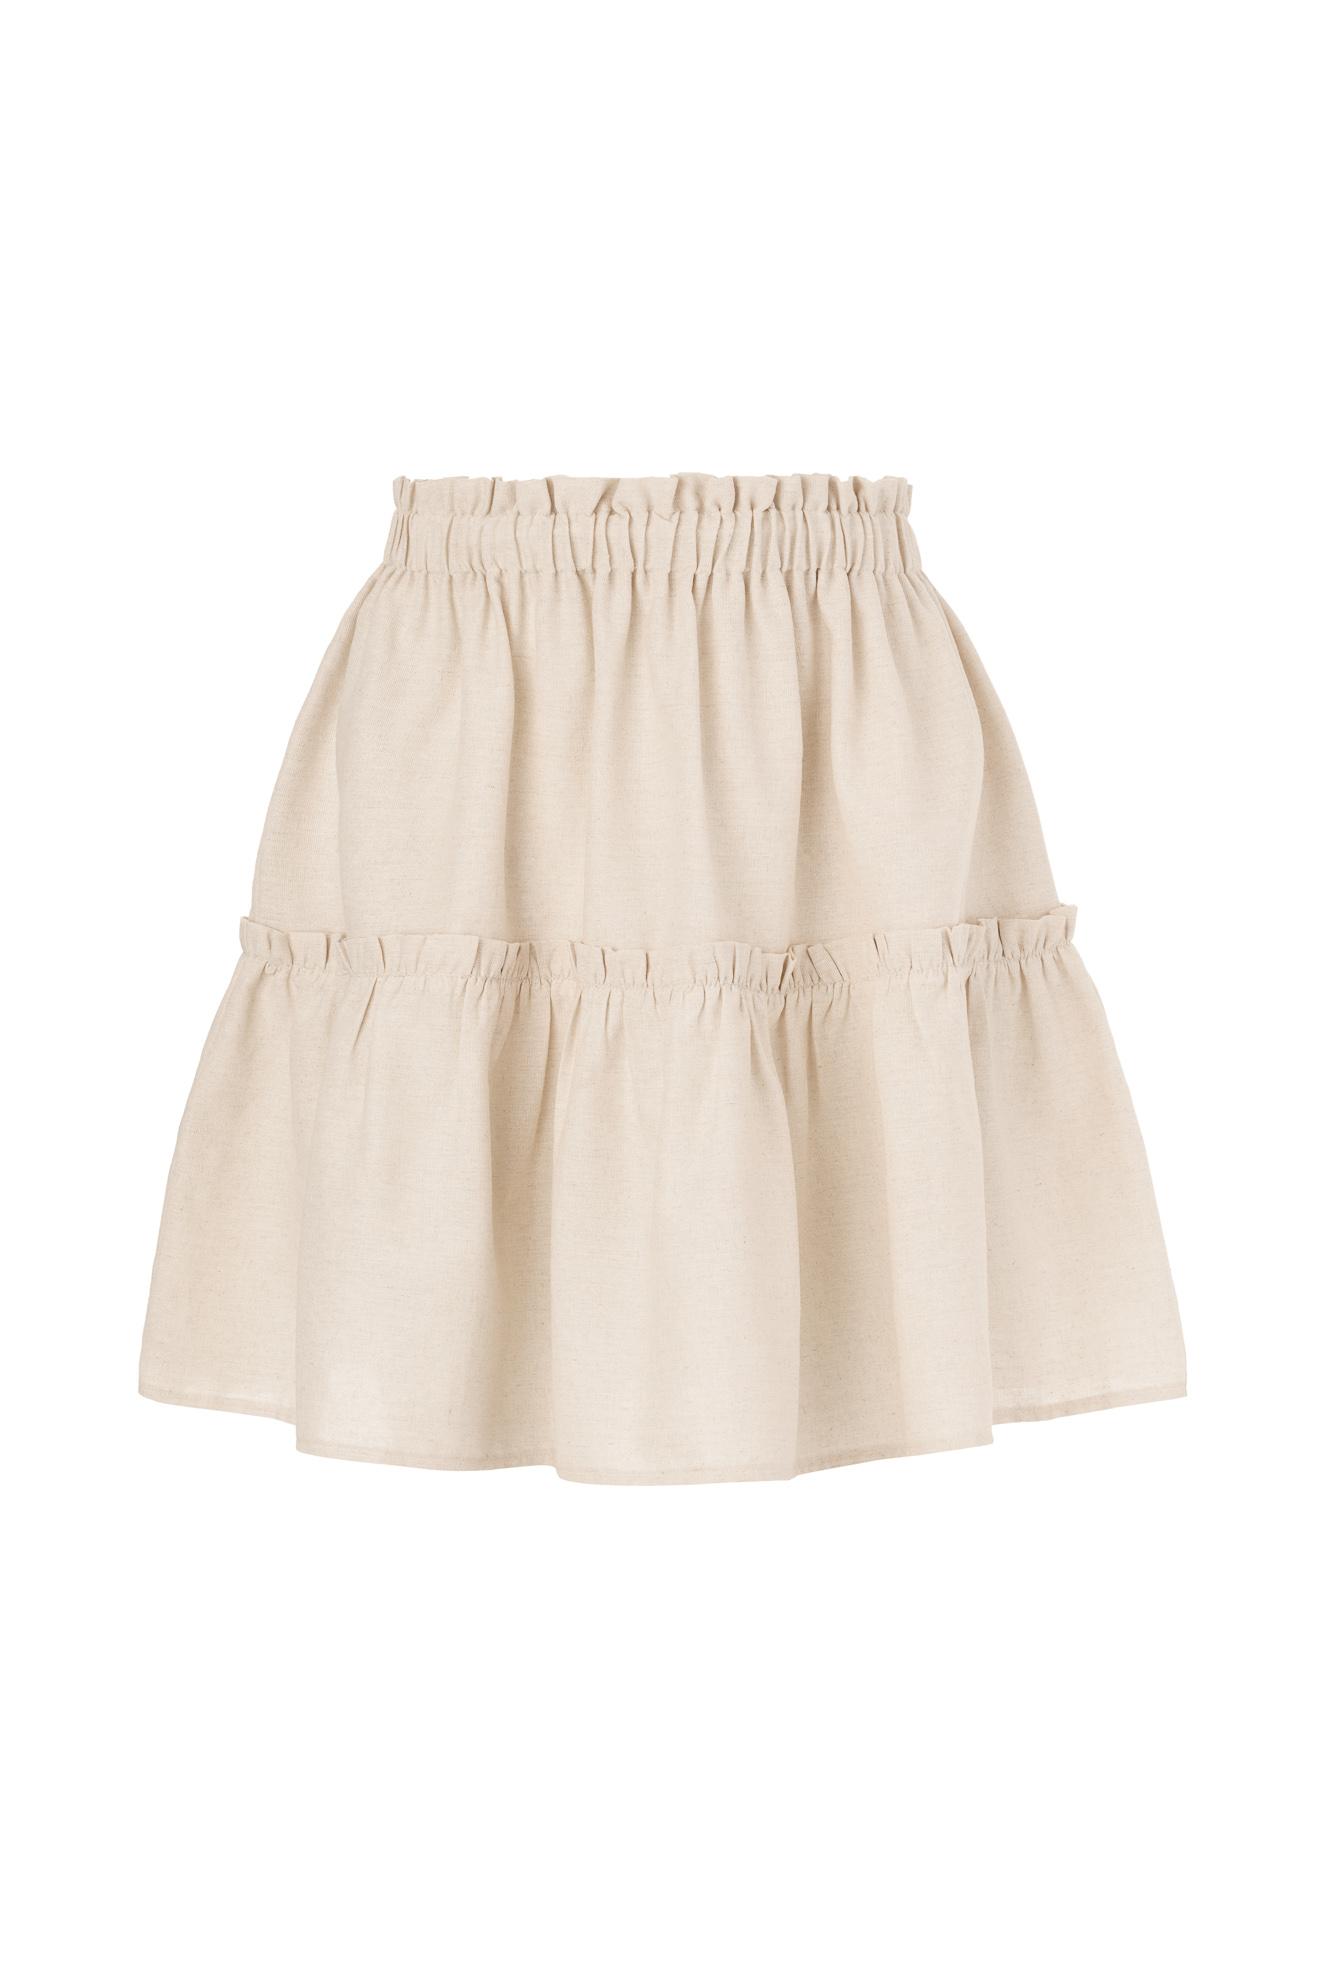 Denina Martin linen blend skirt